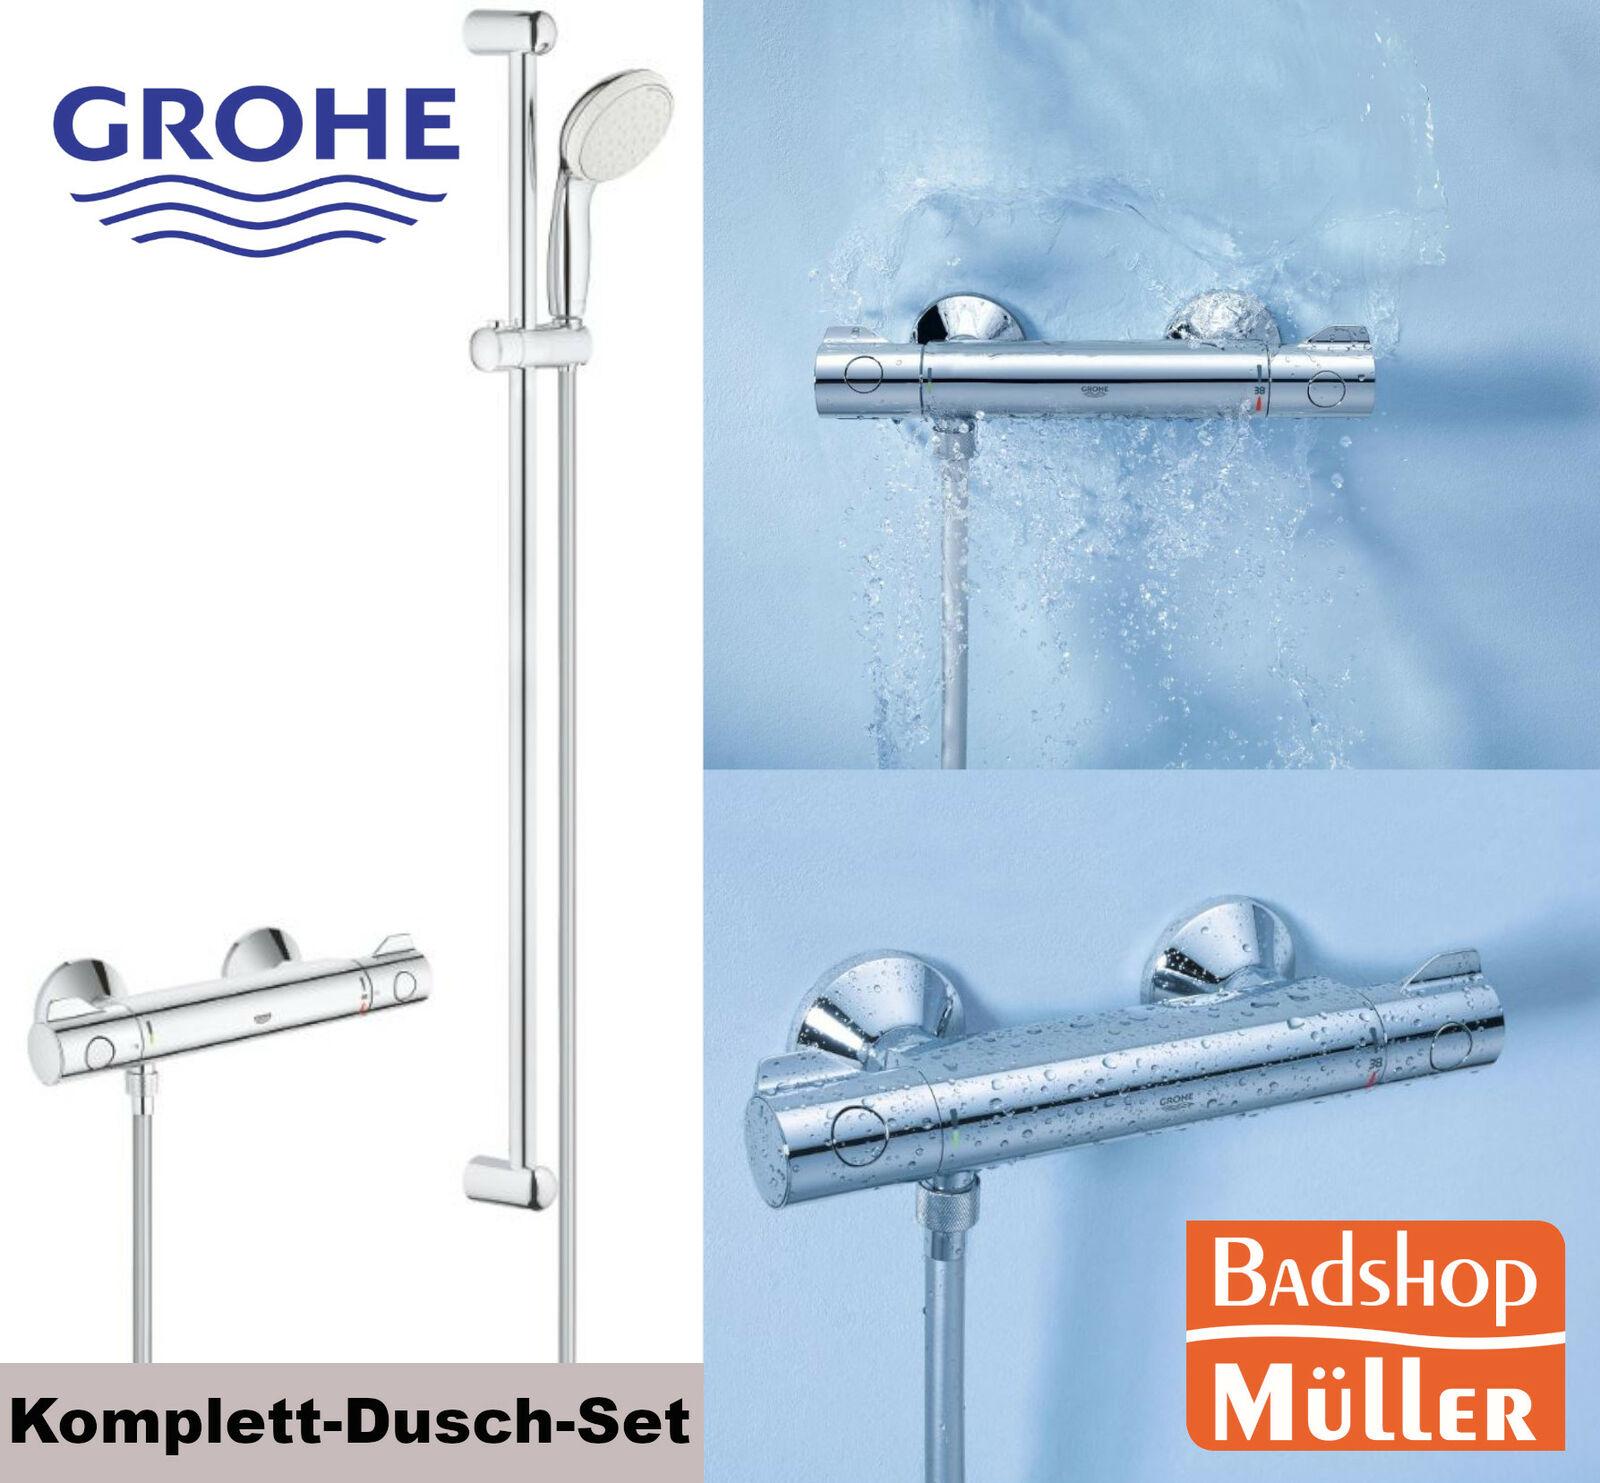 GROHE Grohtherm 800 Komplettset Thermostat Dusche Handbrause 900 mm 34566001